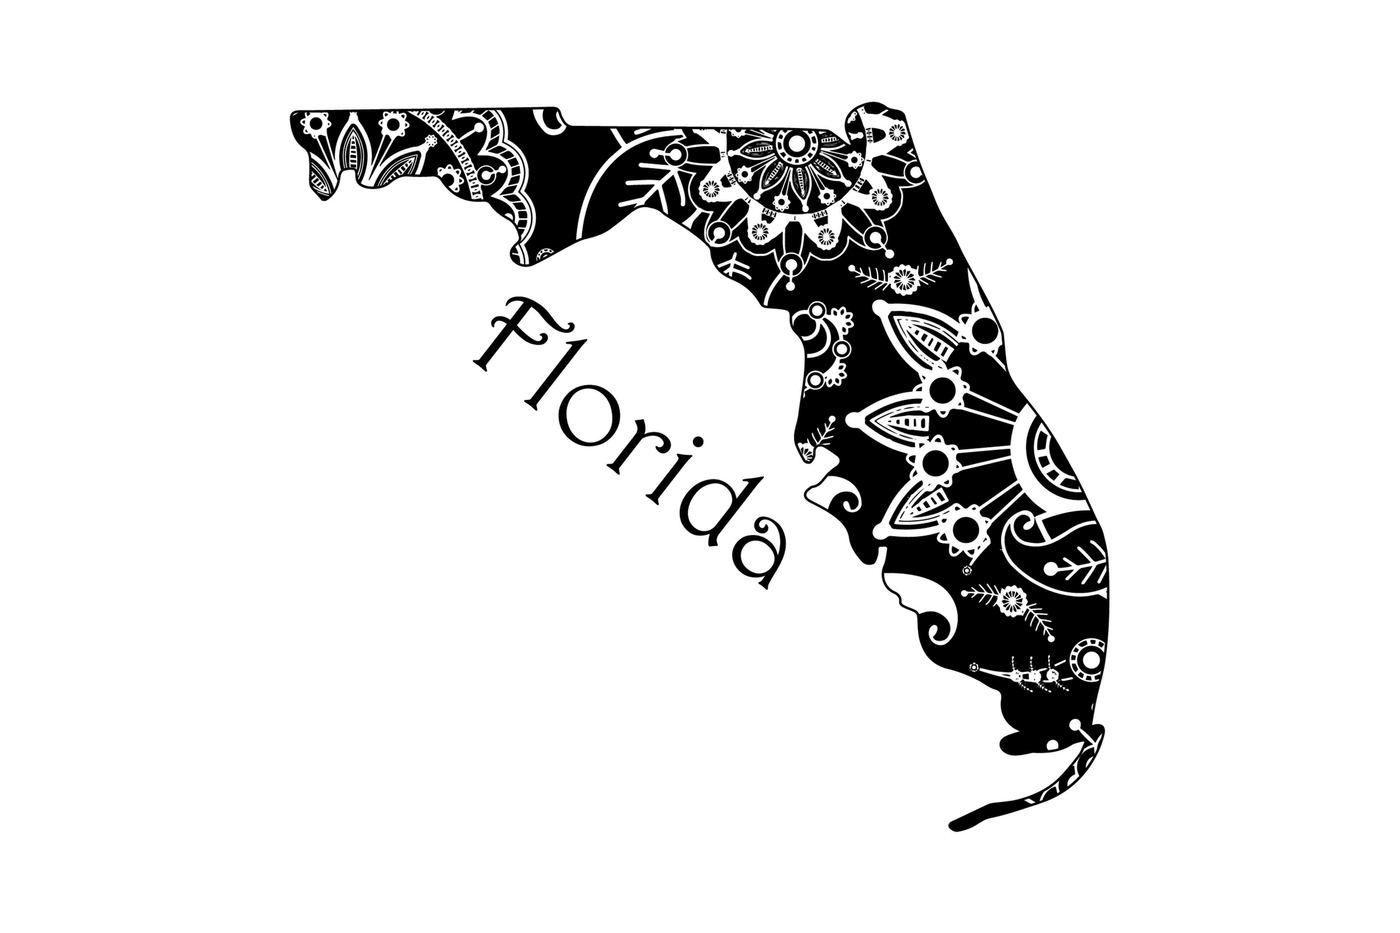 Mandala Florida Svg Dxf Eps Png Ai By Twelvepapers Thehungryjpeg Com Svg Sponsored Dxf Mandala Florida Adver Mandala Designs To Draw Abstract Design